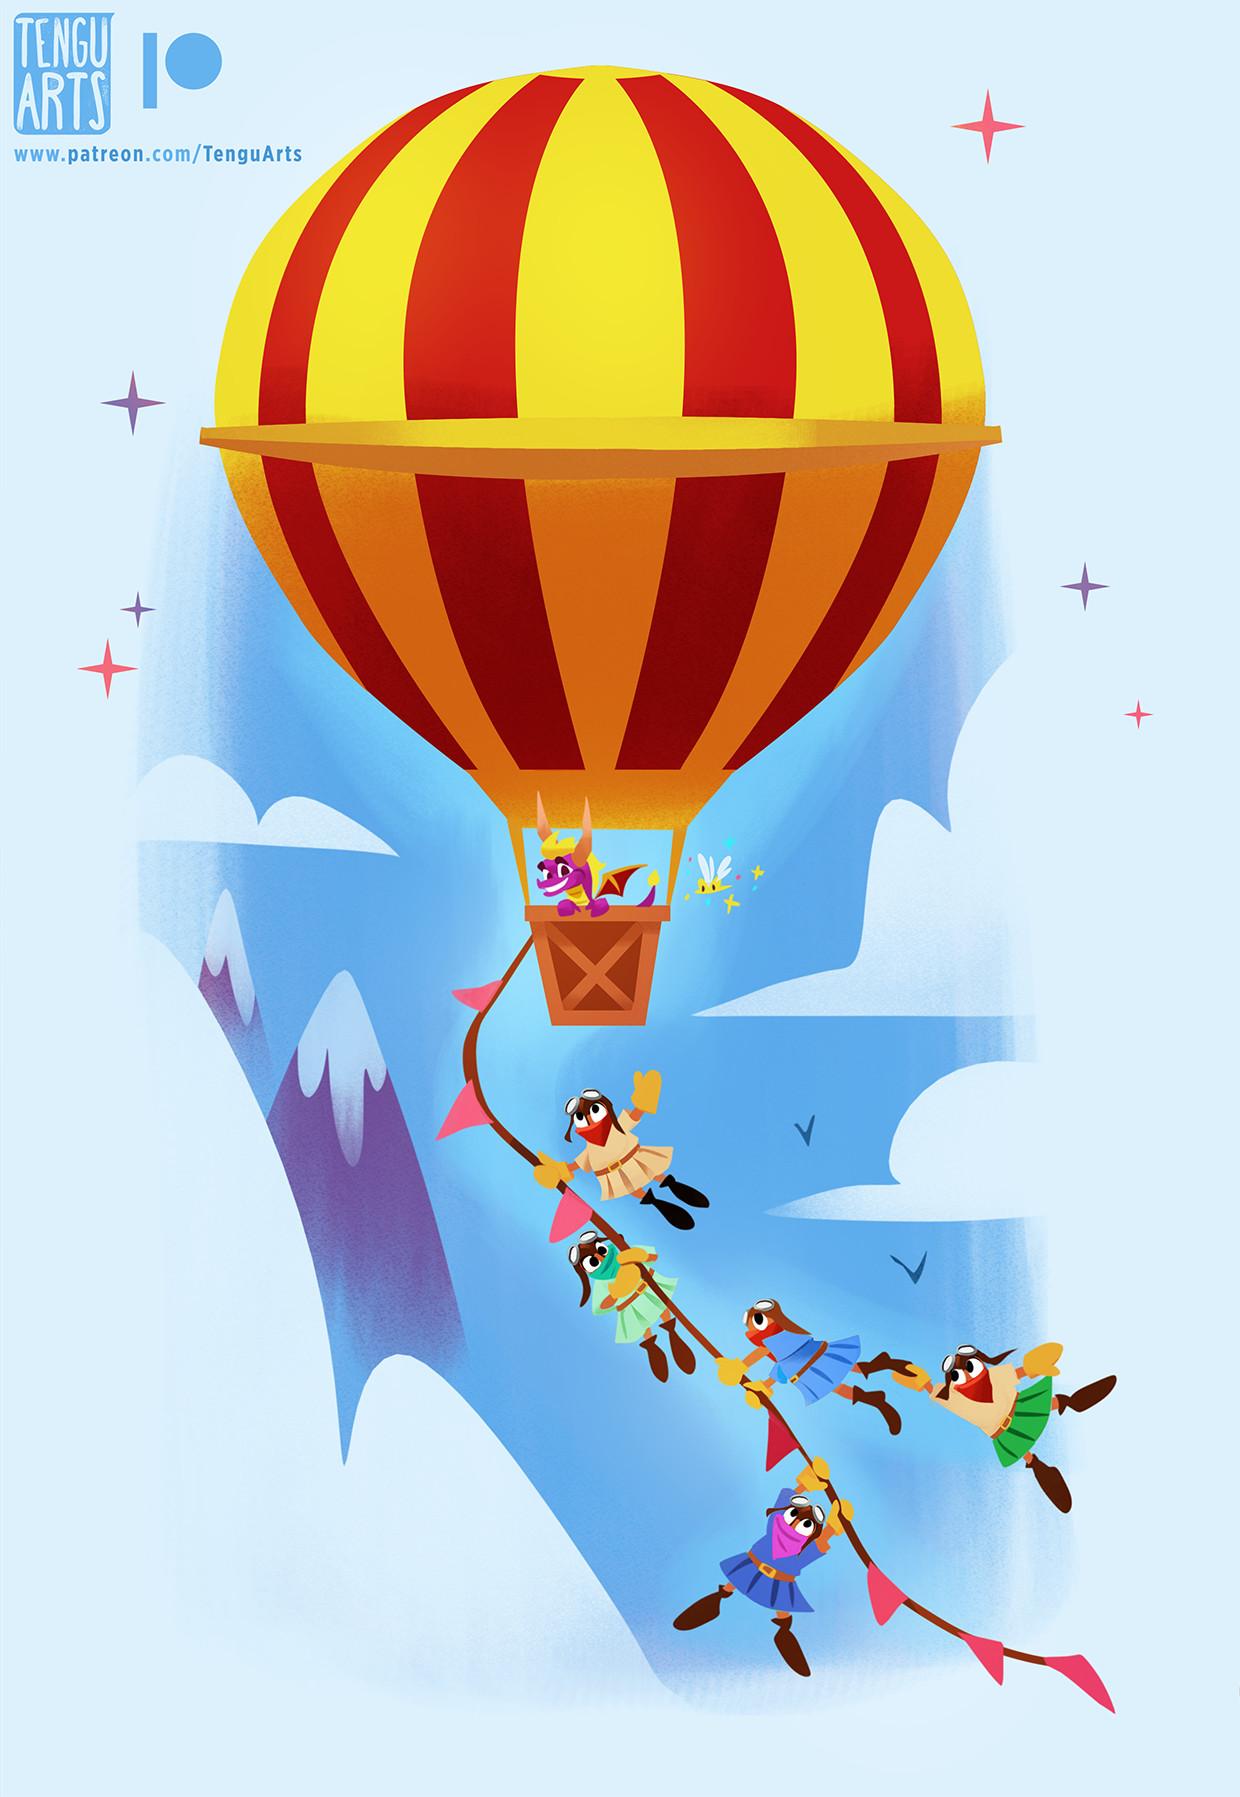 Tengu arts balloonist internets